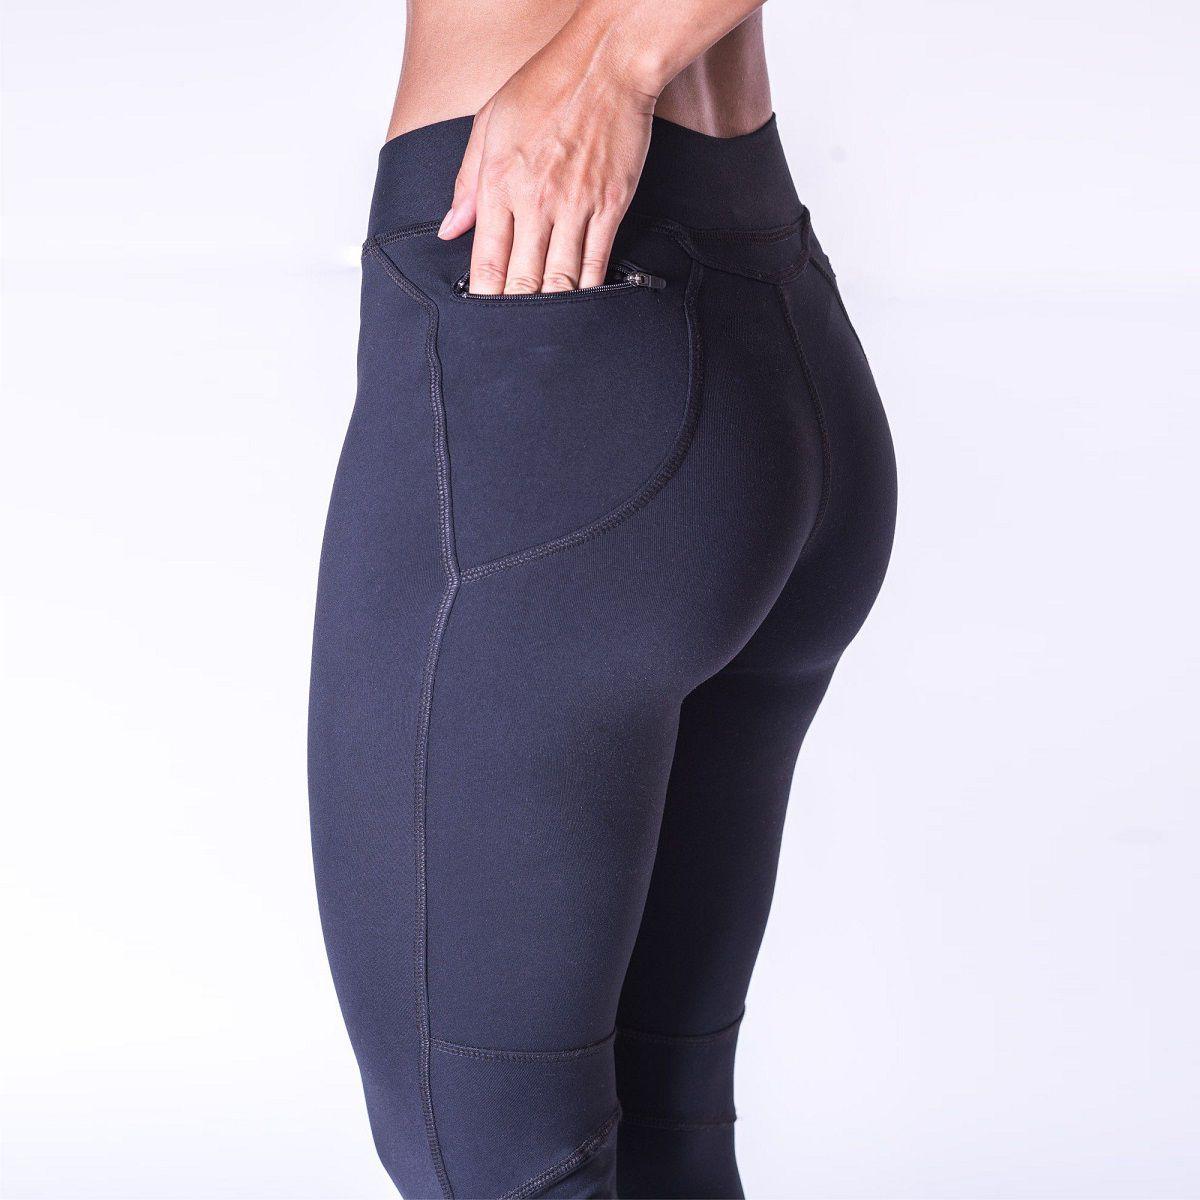 Calça Legging Feminina Hard Black Trail - Preta